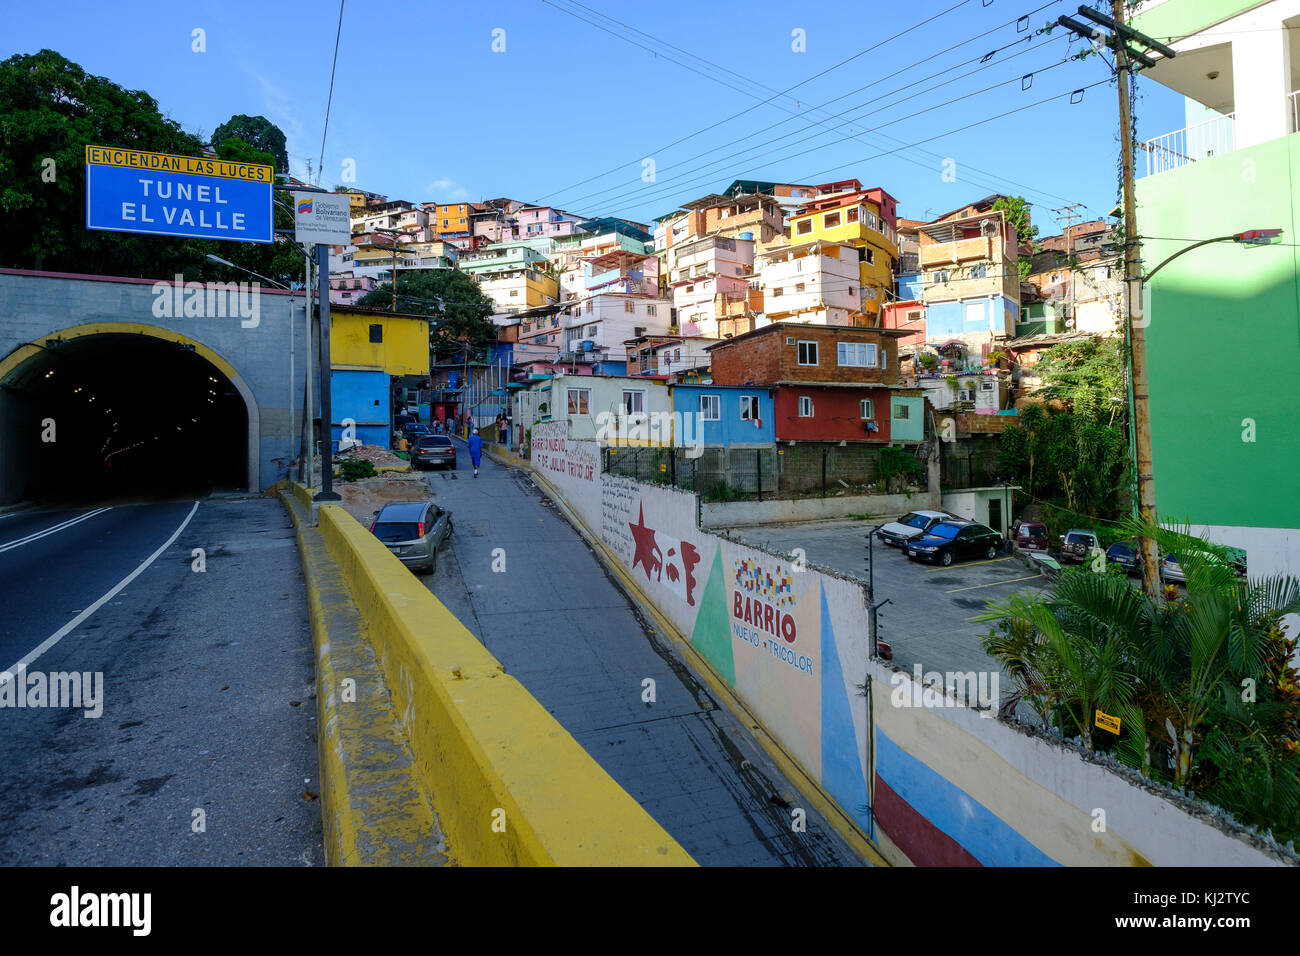 Venezuela, Santiago de Leon de Caracas: shanty towns in the upper city - Stock Image